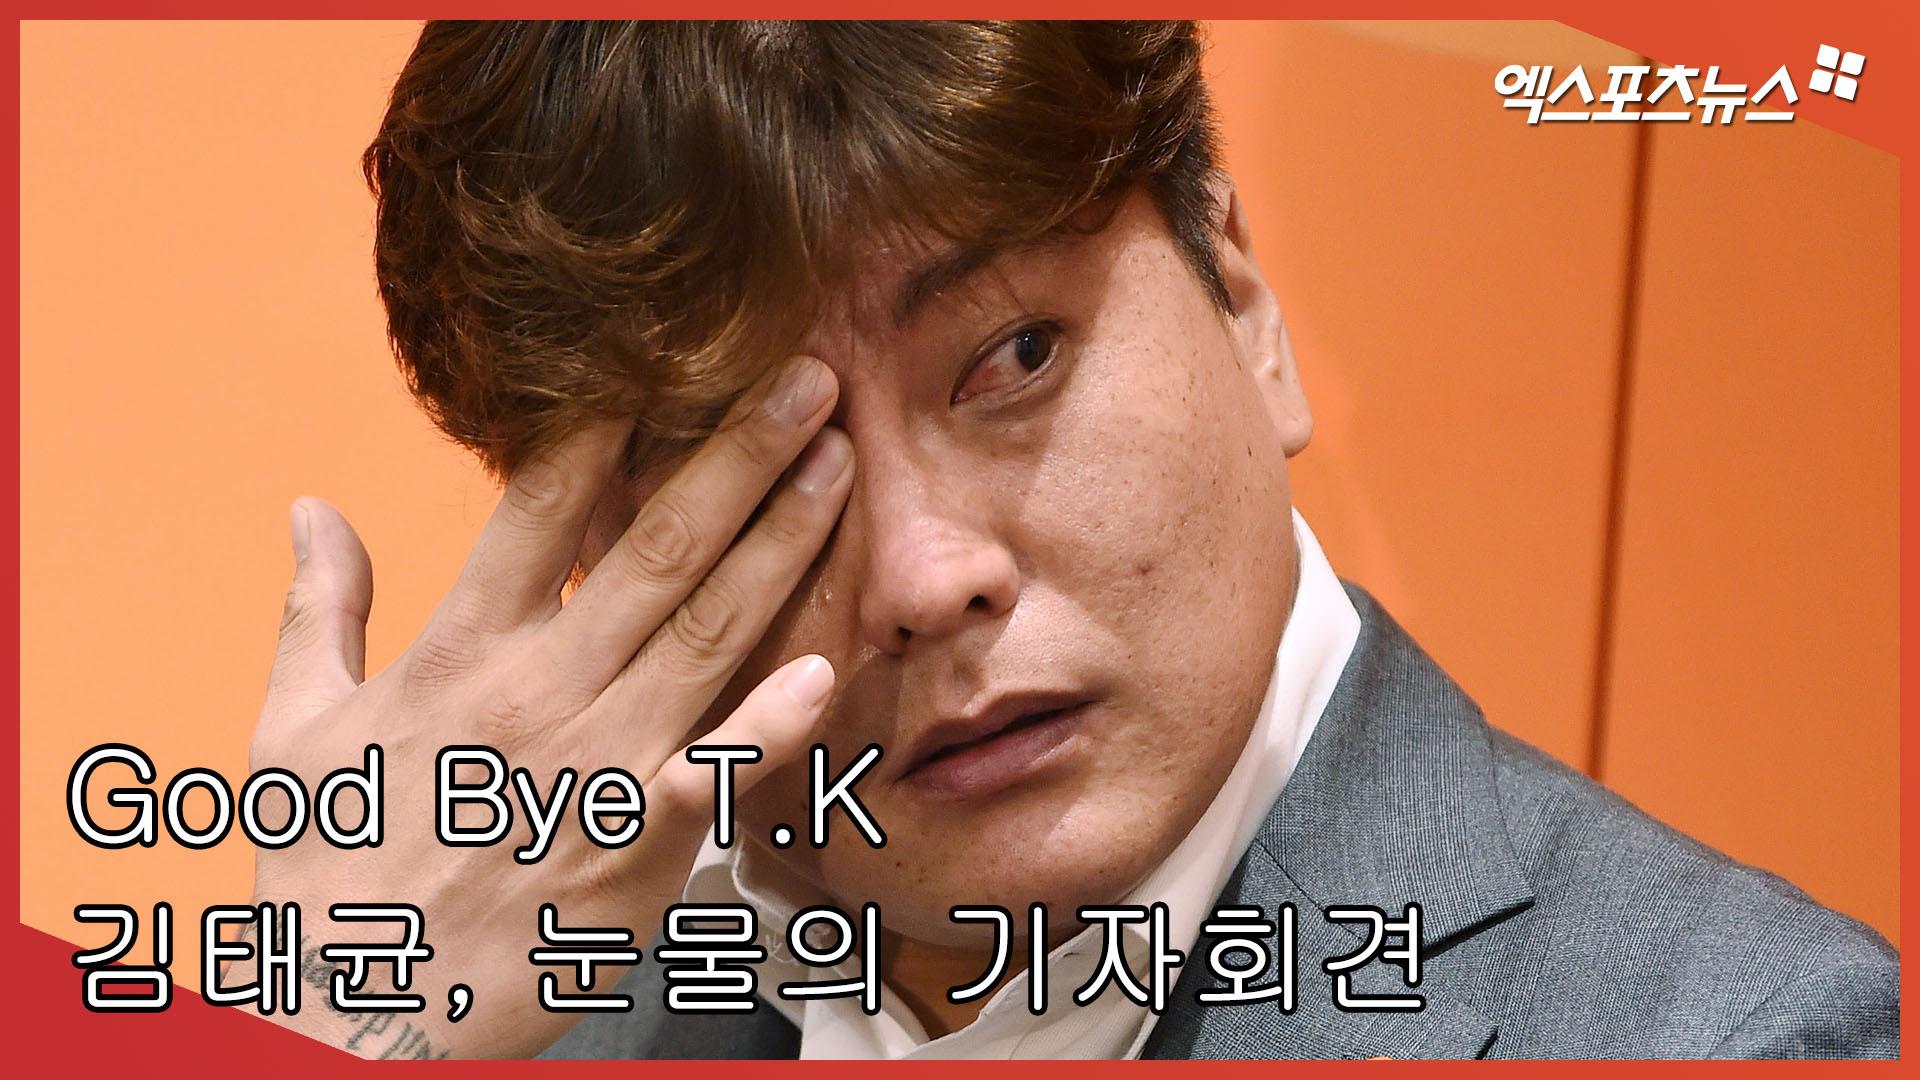 'Good Bye T.K' 김태균, 눈물의 은퇴 기자회견 [엑's 스케치]